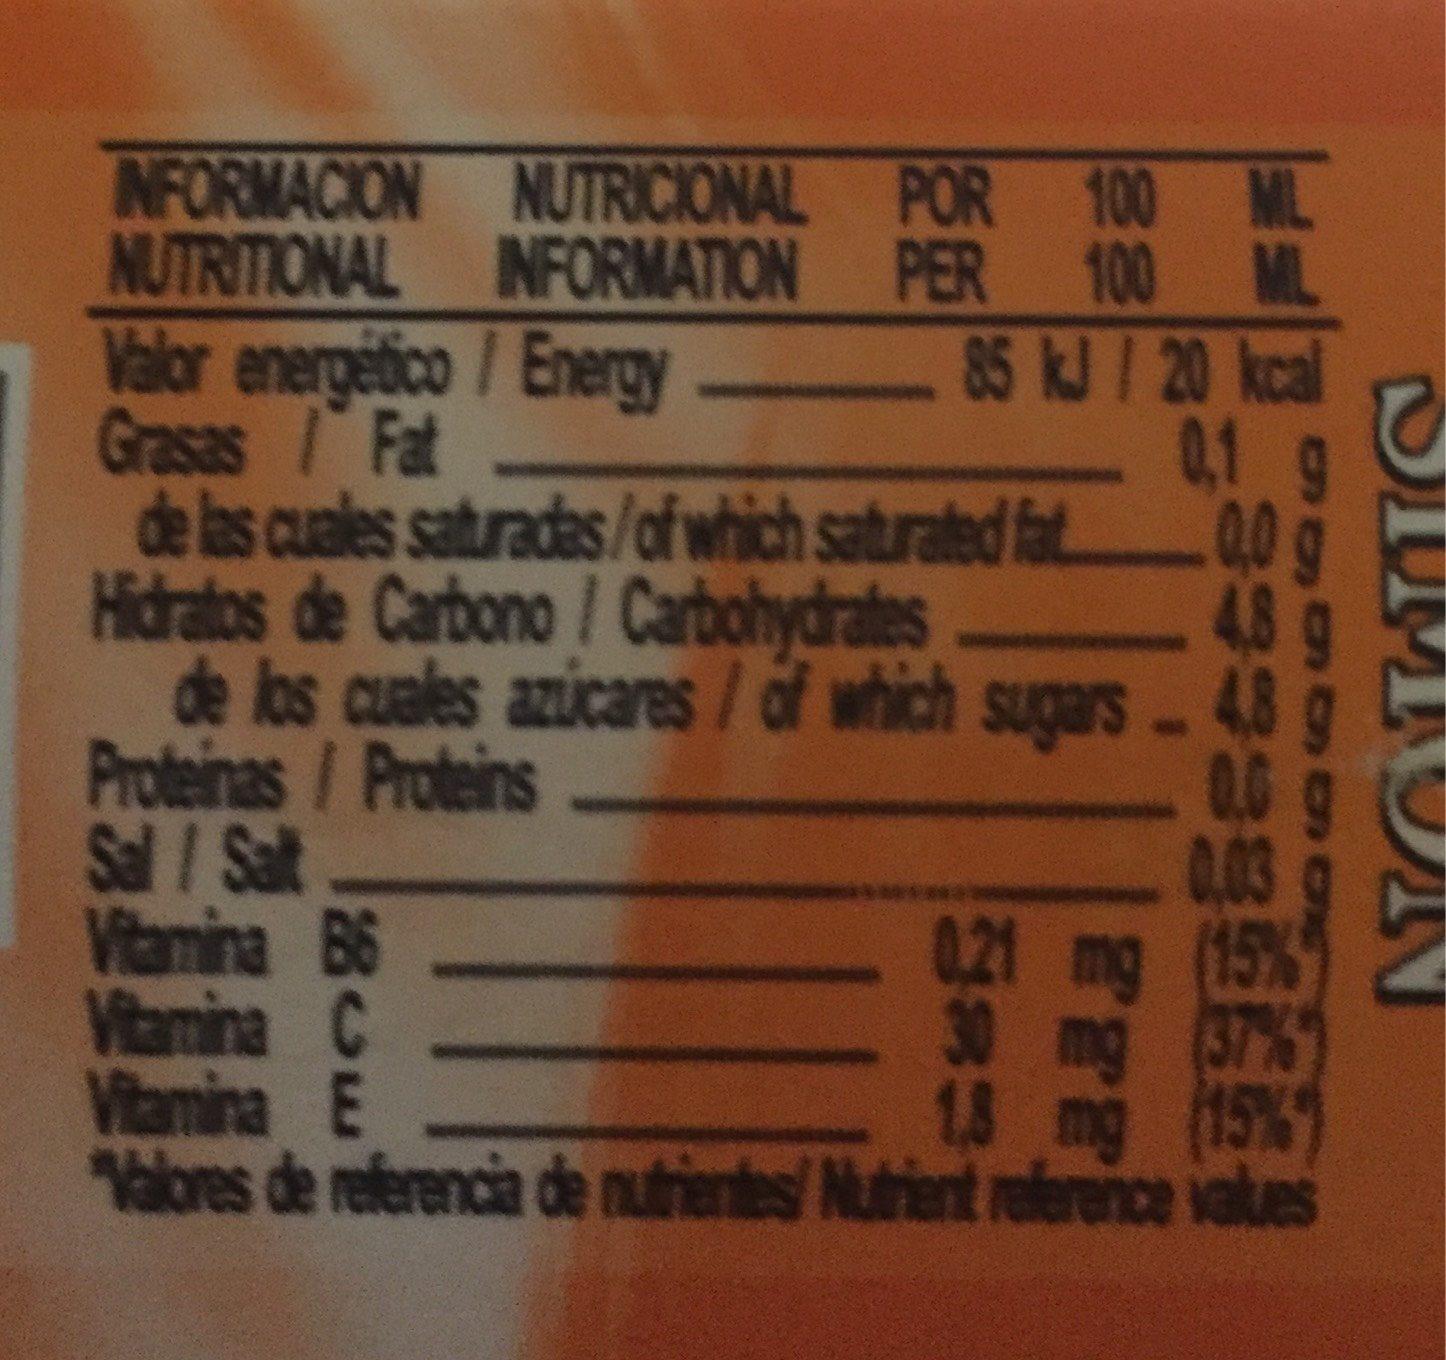 Simon Life naranja - Informations nutritionnelles - fr